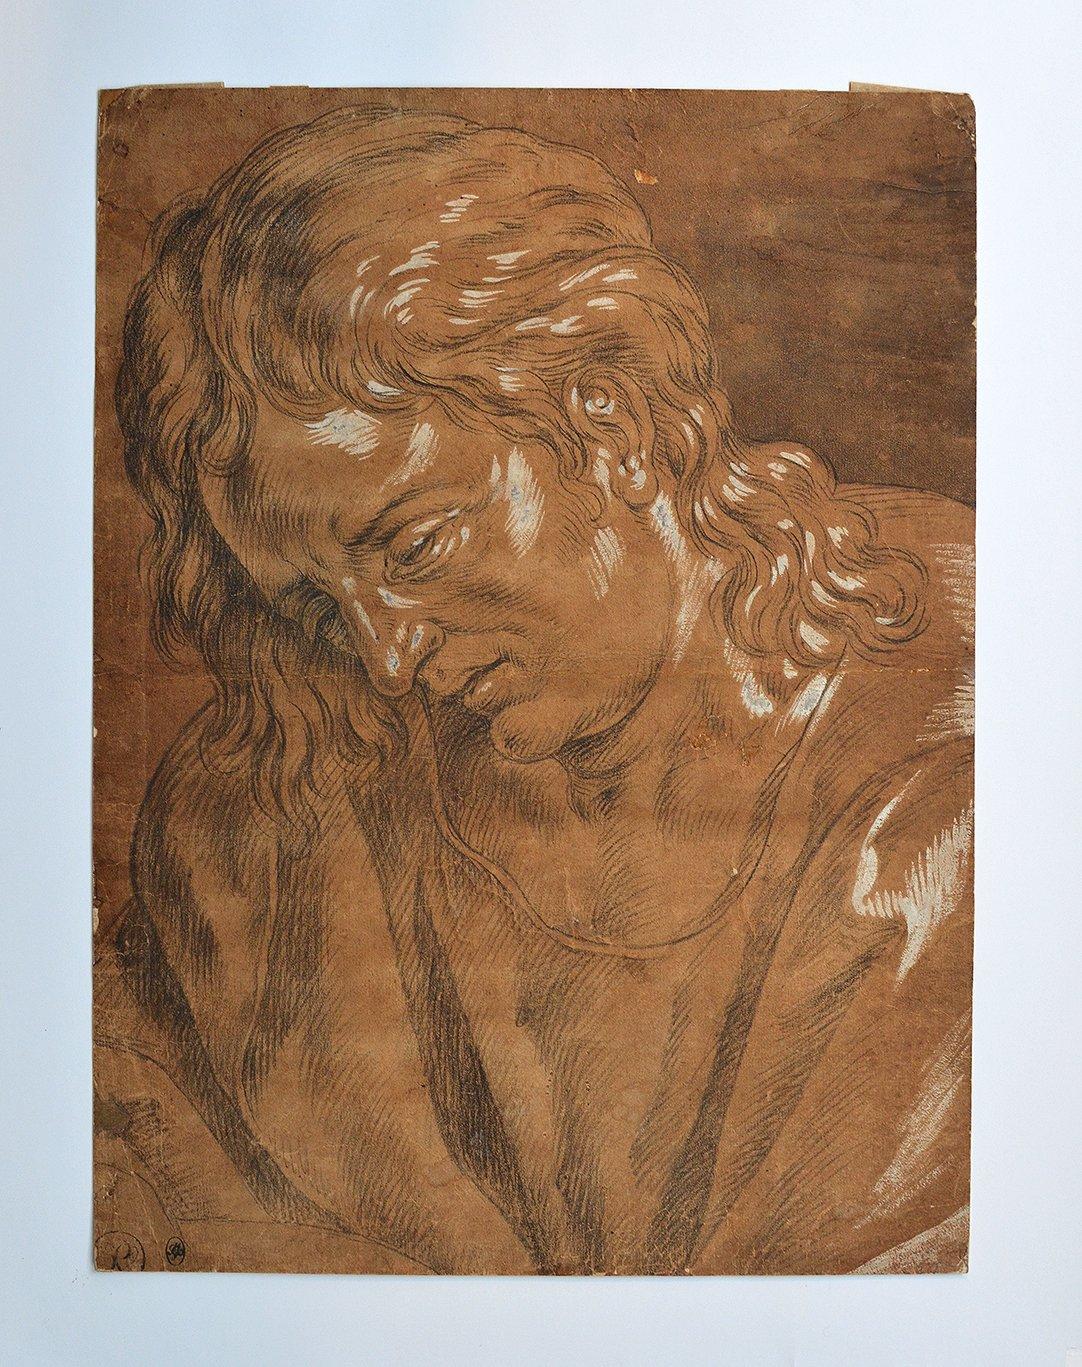 Image of German Old Master Drawing, school of Albrecht Dürer, 16th century